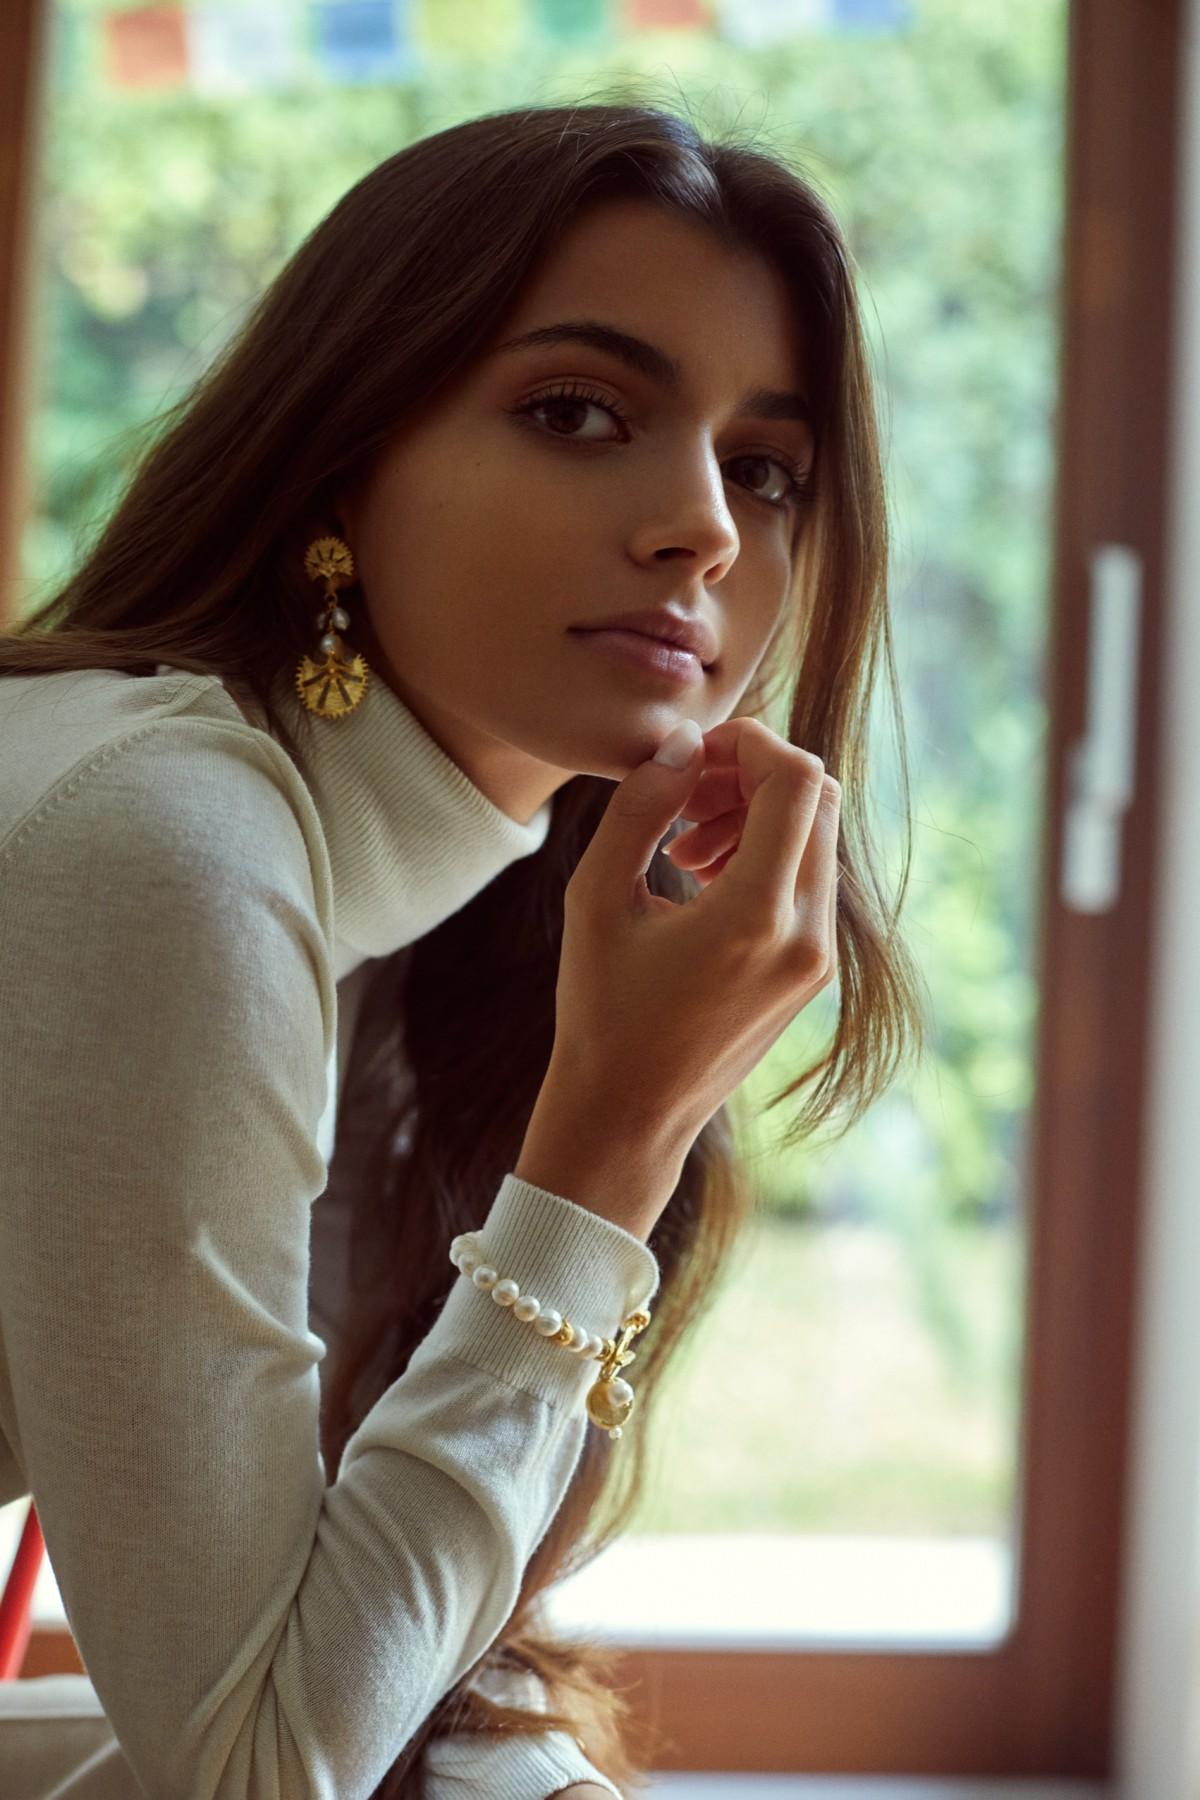 Daria XL Earrings